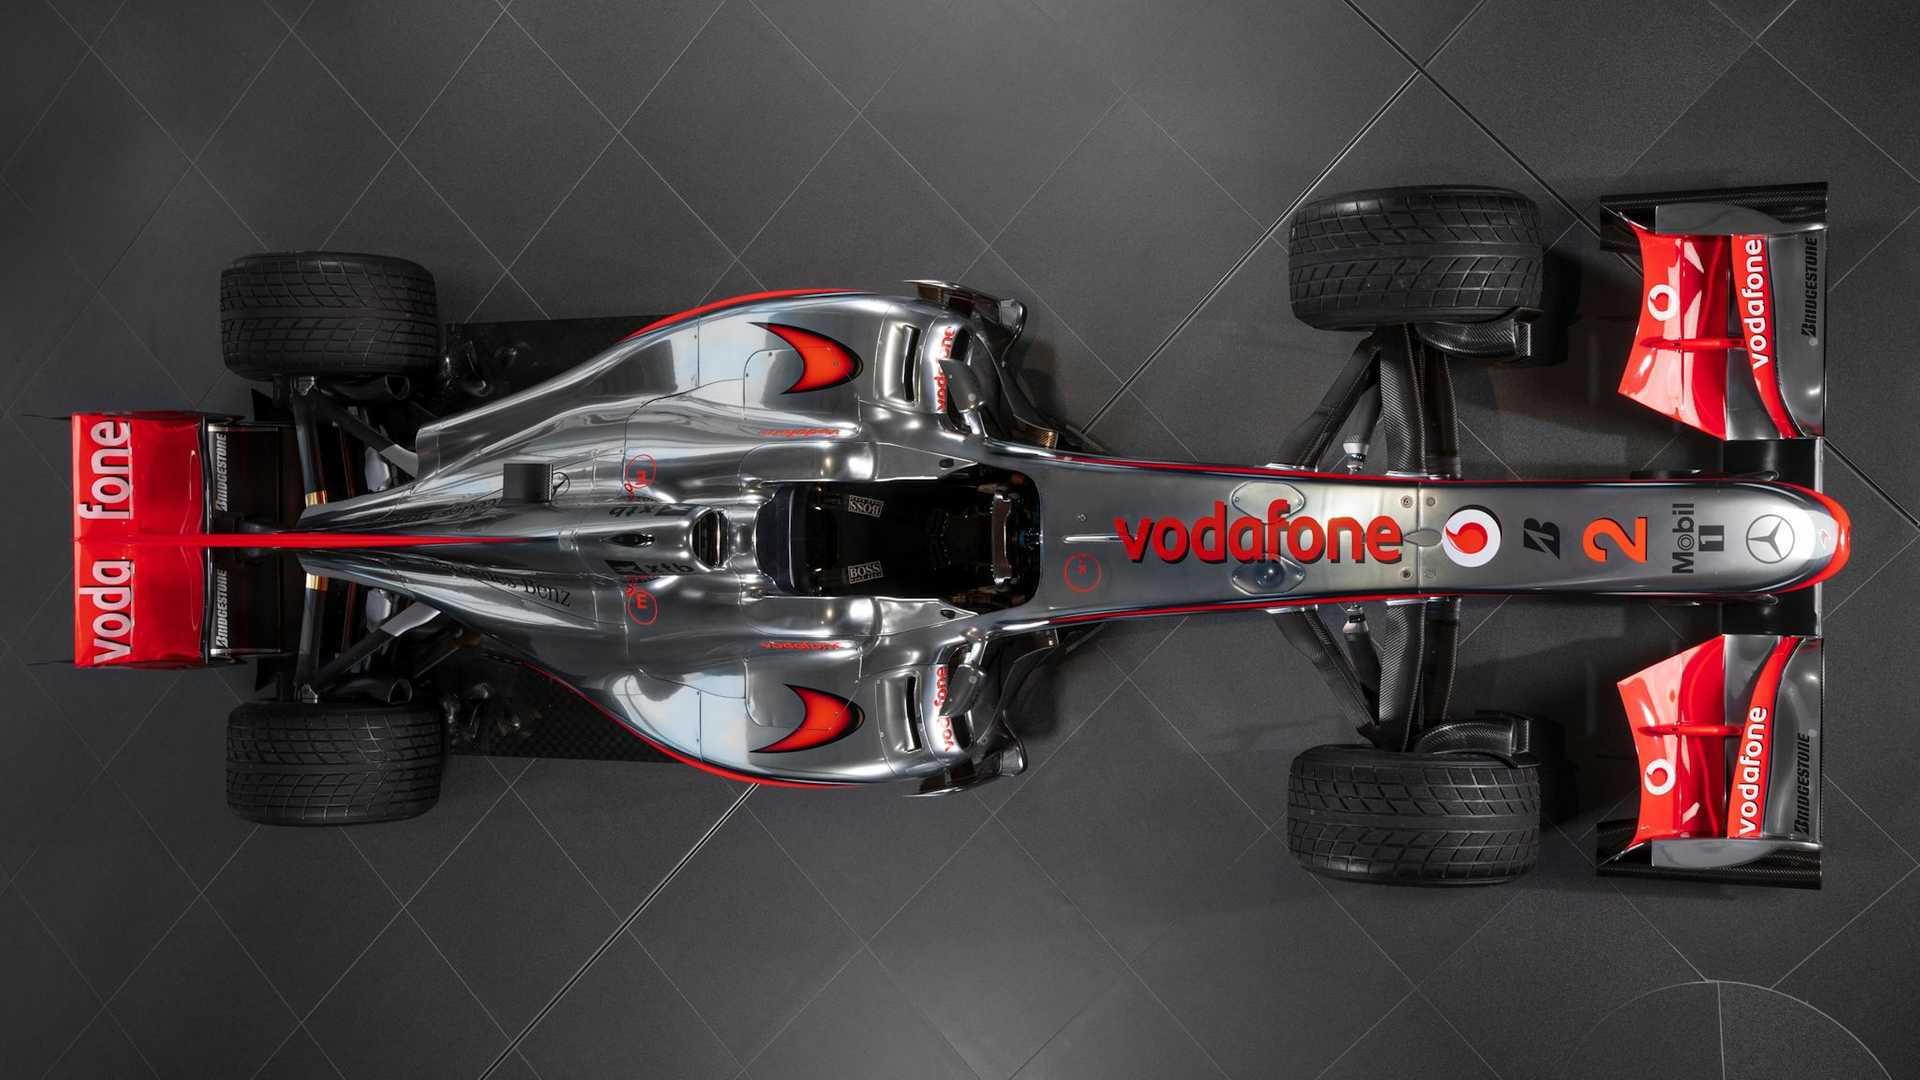 2010 McLaren MP4-25 Formula One car driven by Lewis Hamilton - Photo credit: RM Sotheby's